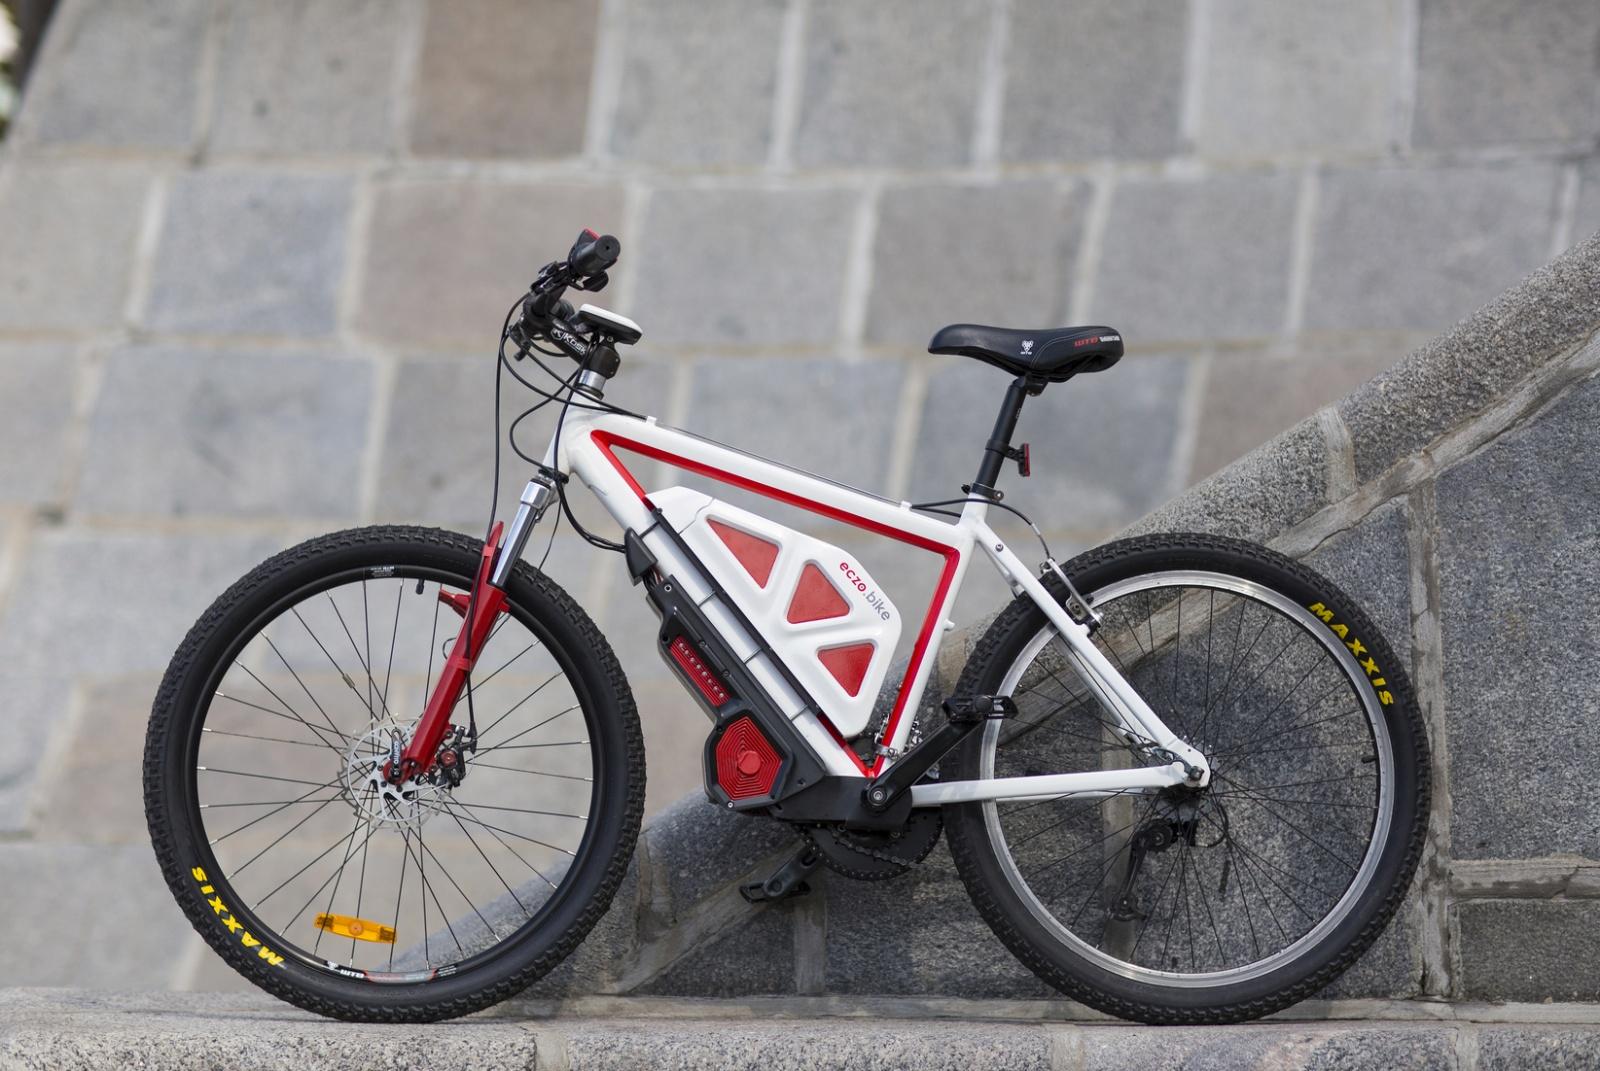 Разработка комплекта электрификации велосипеда - 1